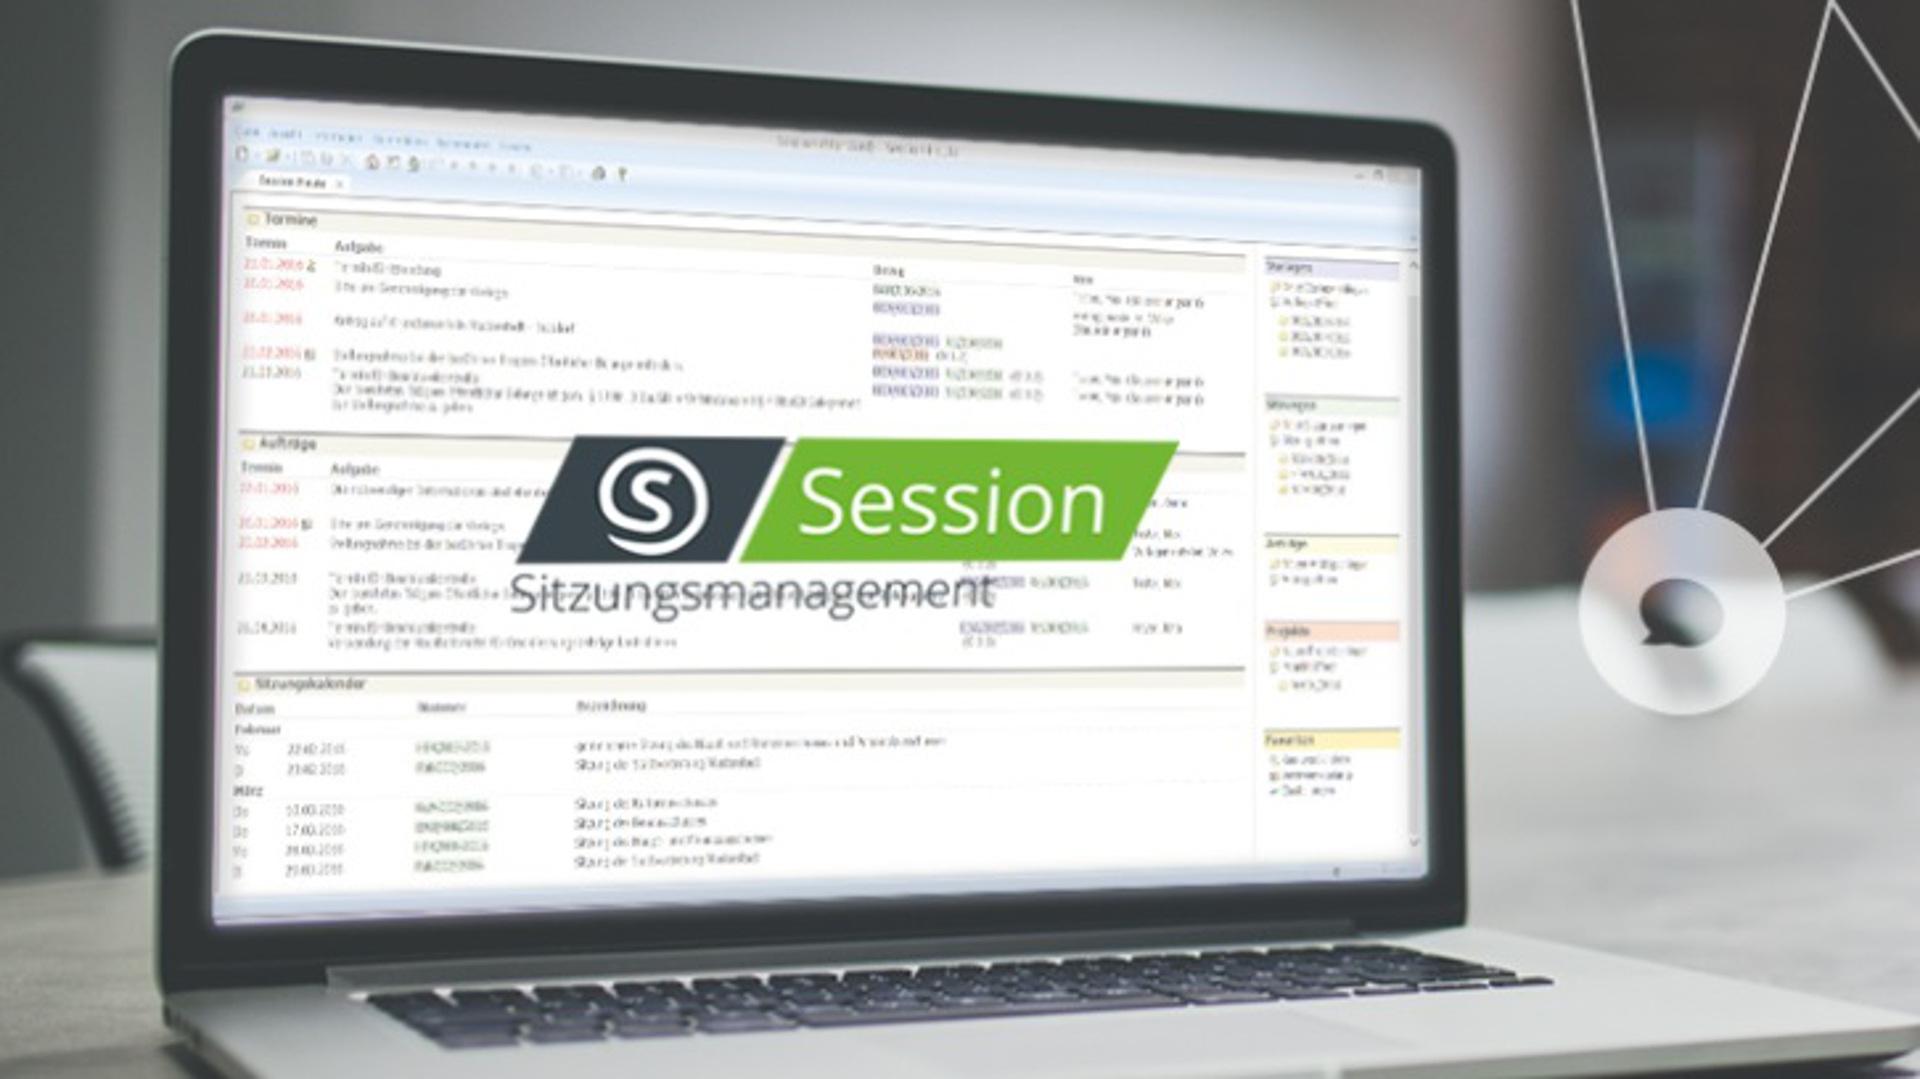 session ©Somacos GmbH und Co. KG